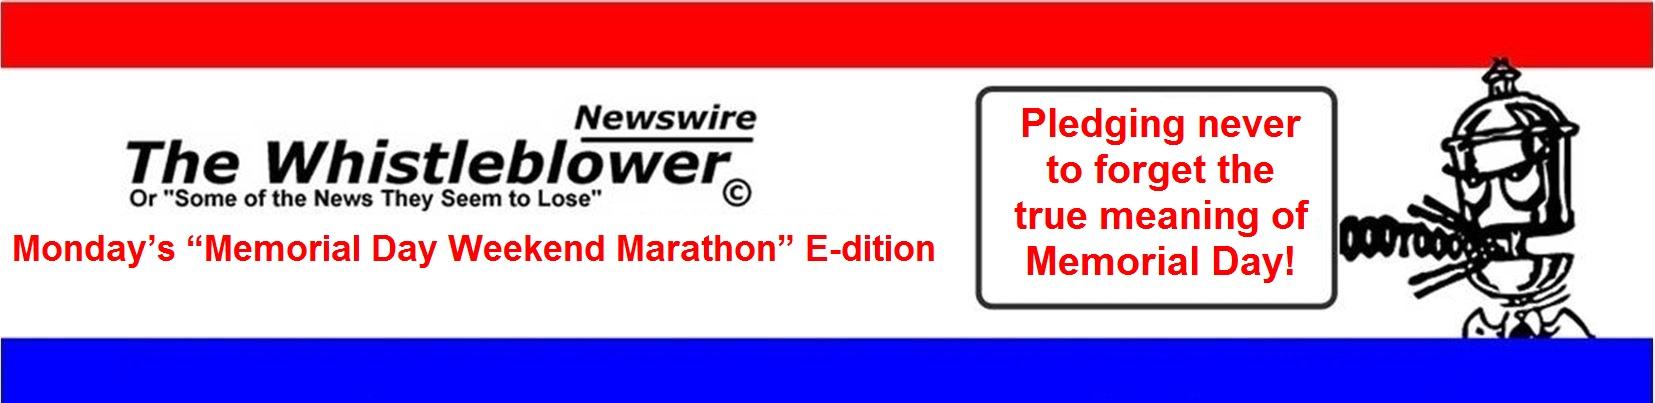 Header May 25 Monday Marathon